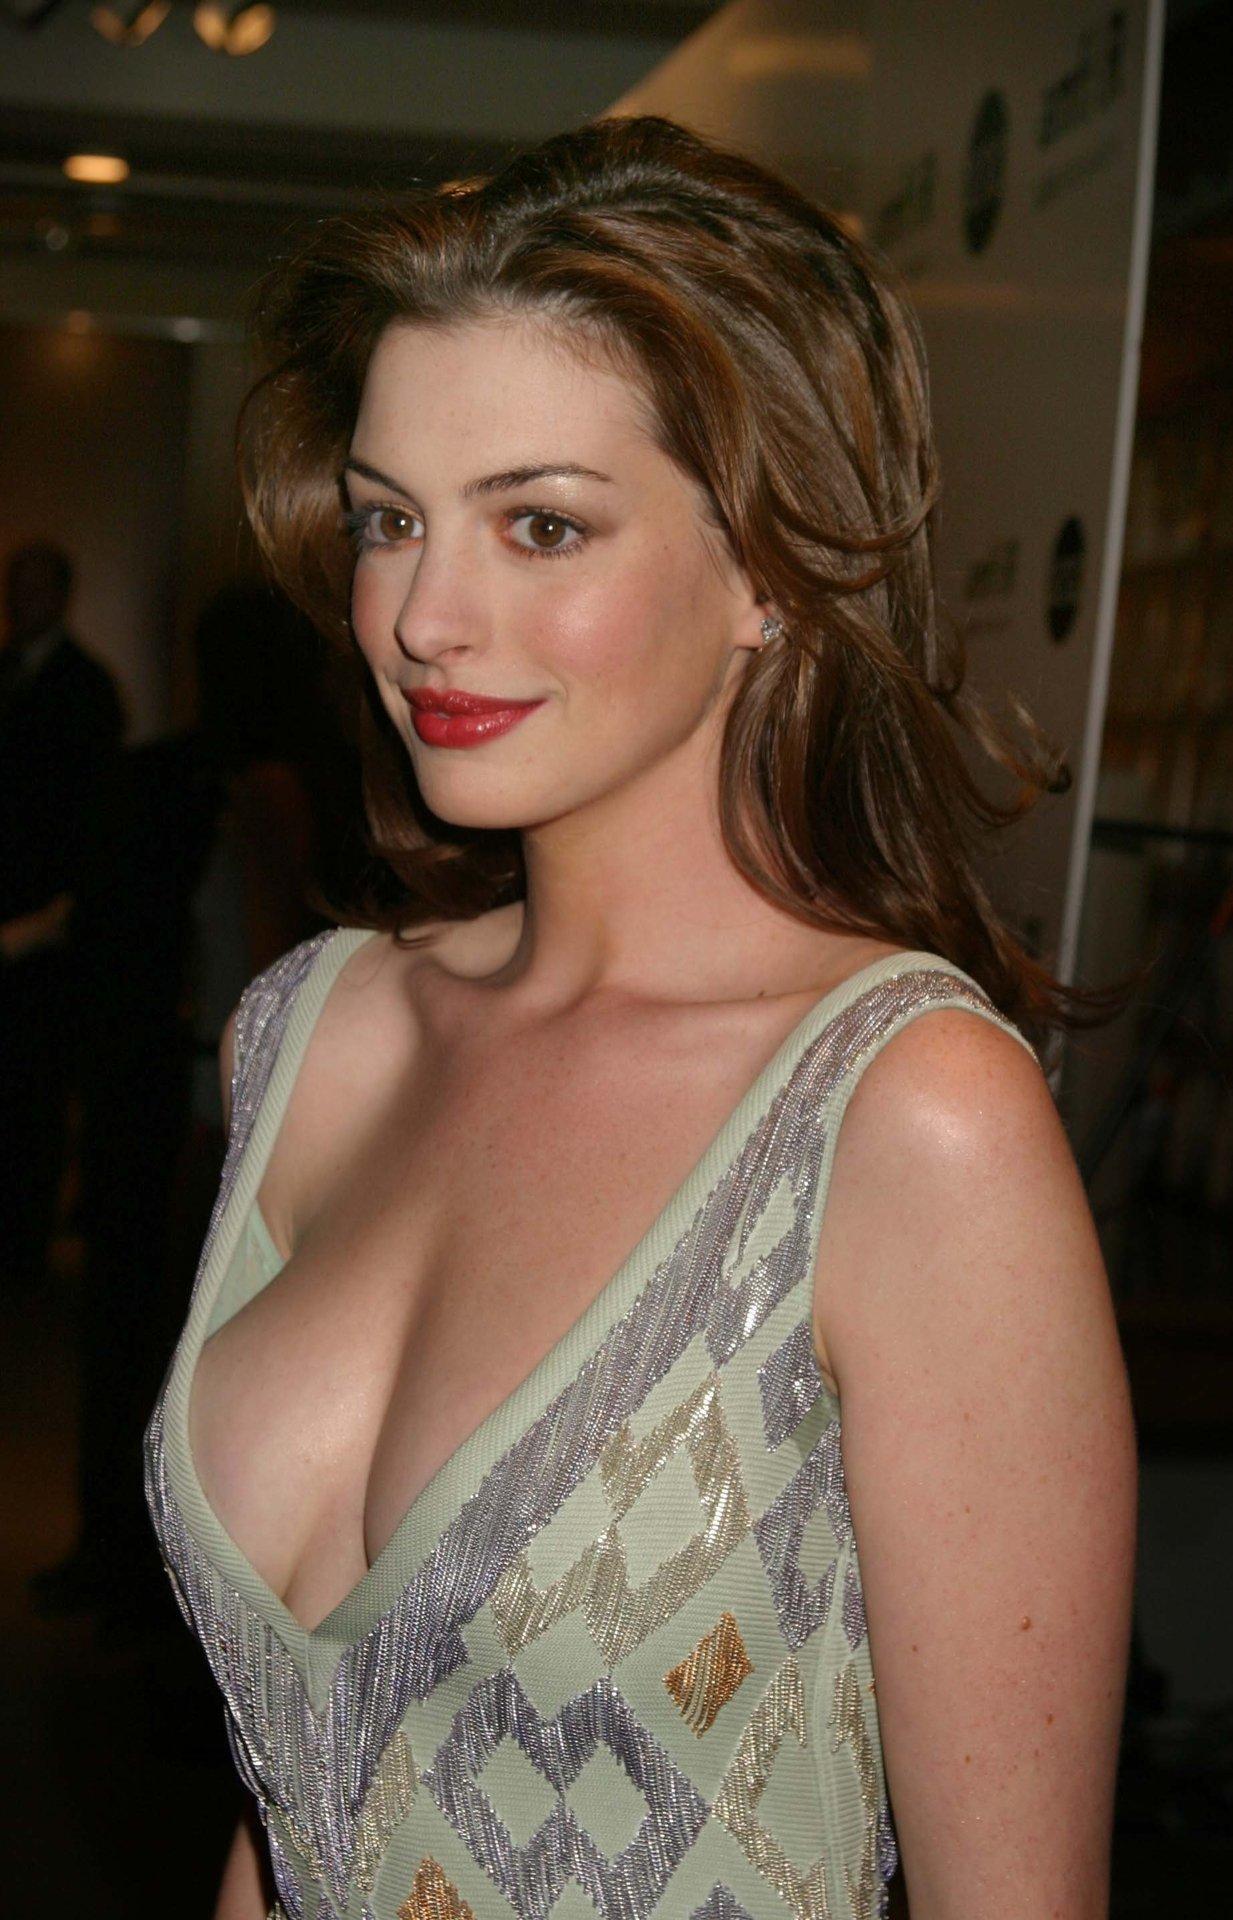 Actress nipples slip